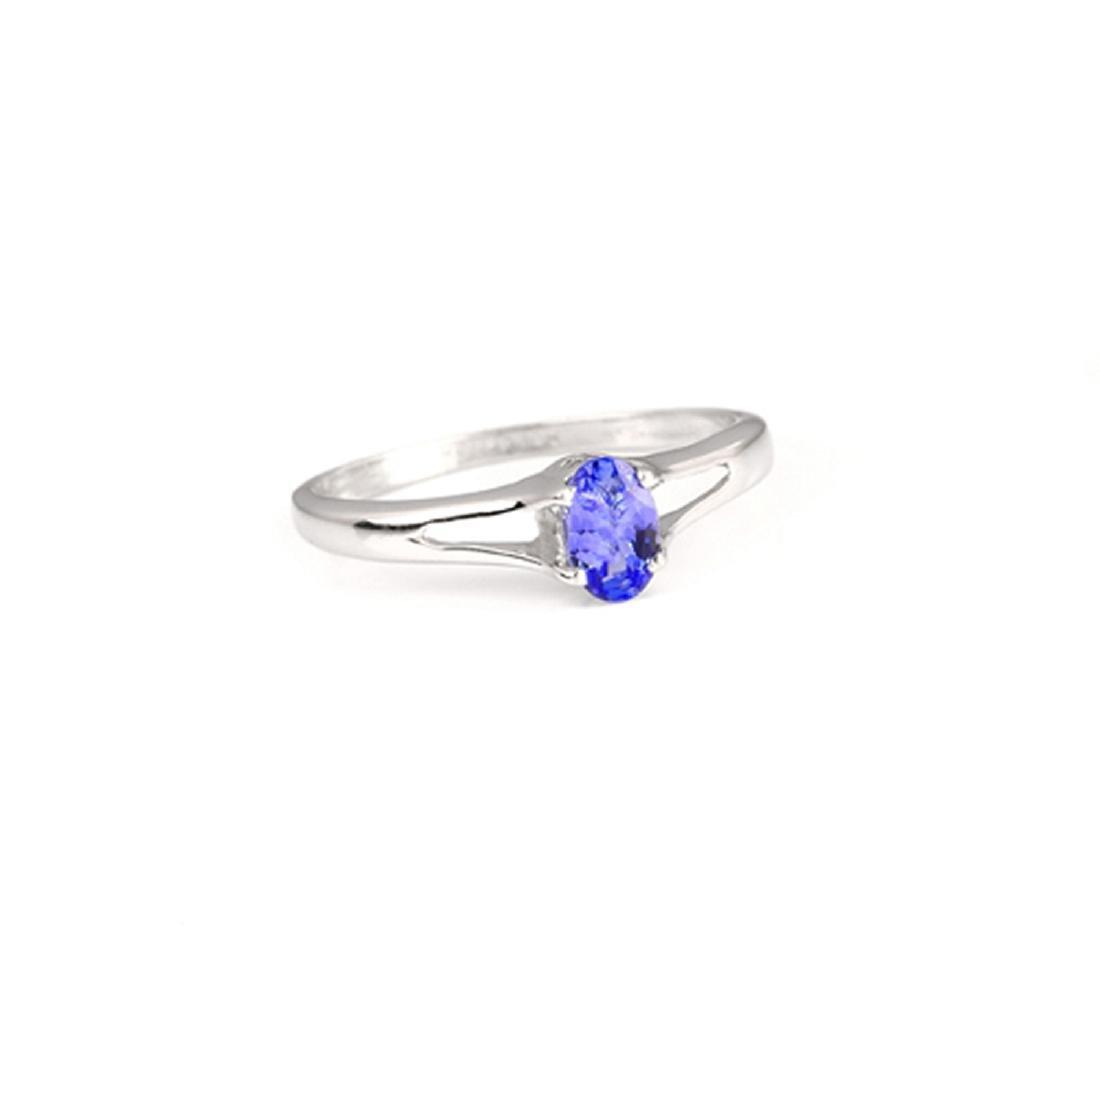 APP: 1.1k Fine Jewelry 0.45CT Oval Cut Tanzanite And